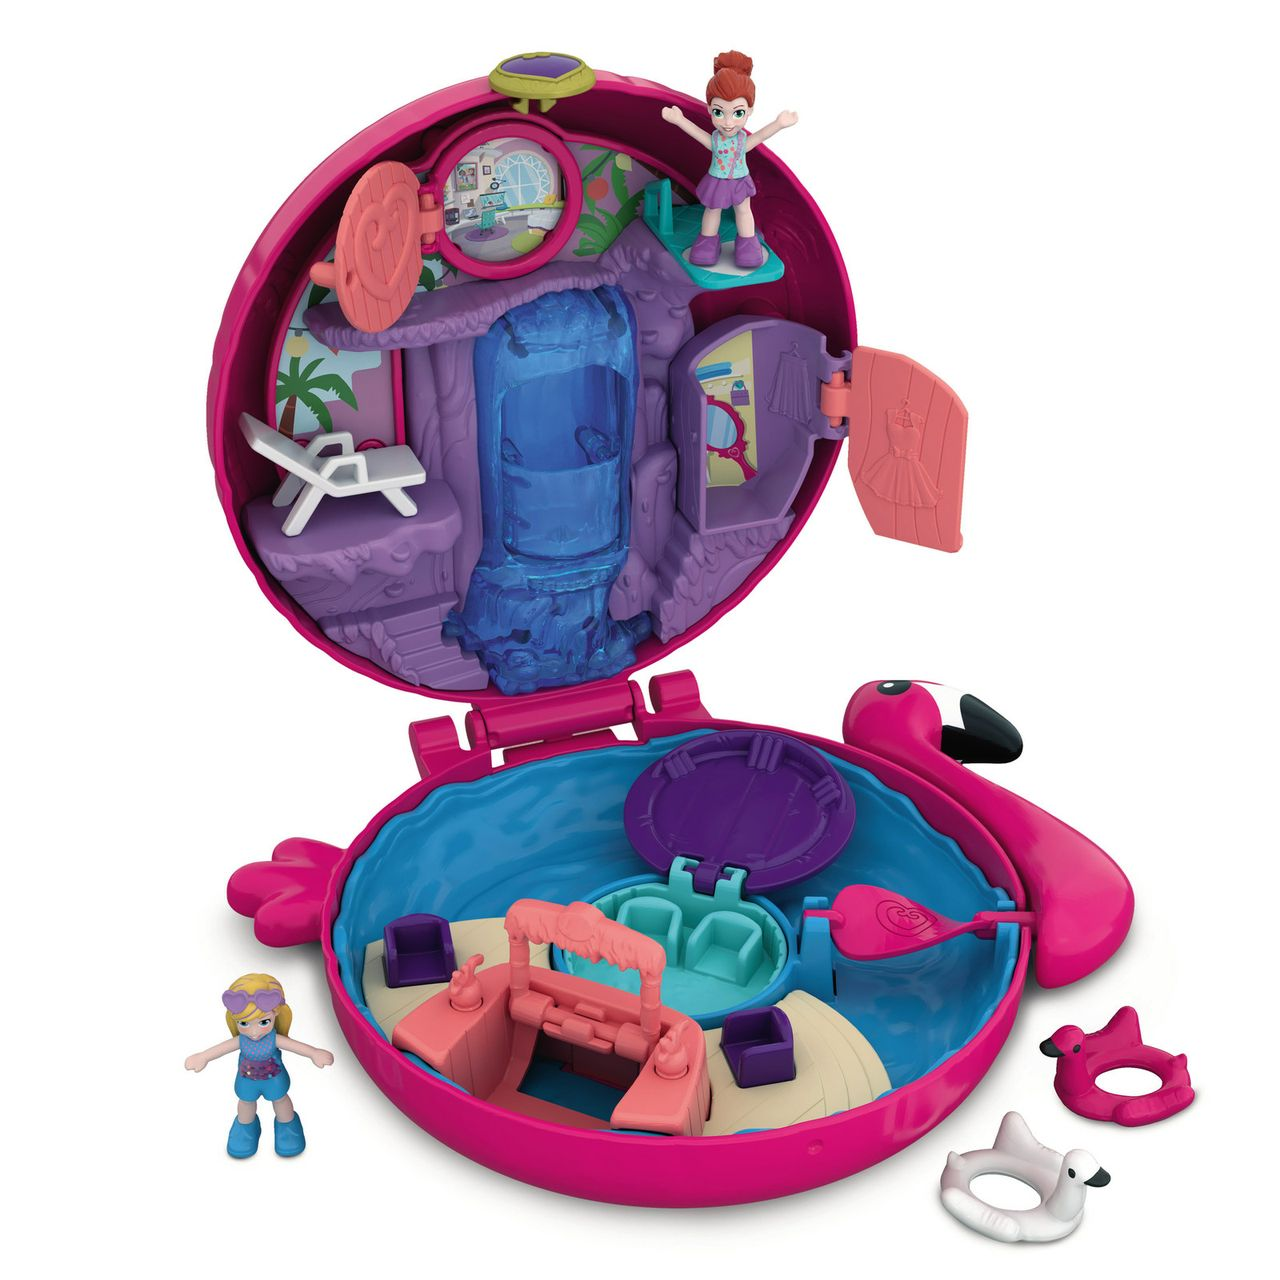 Mattel Polly Pocket Flamingo